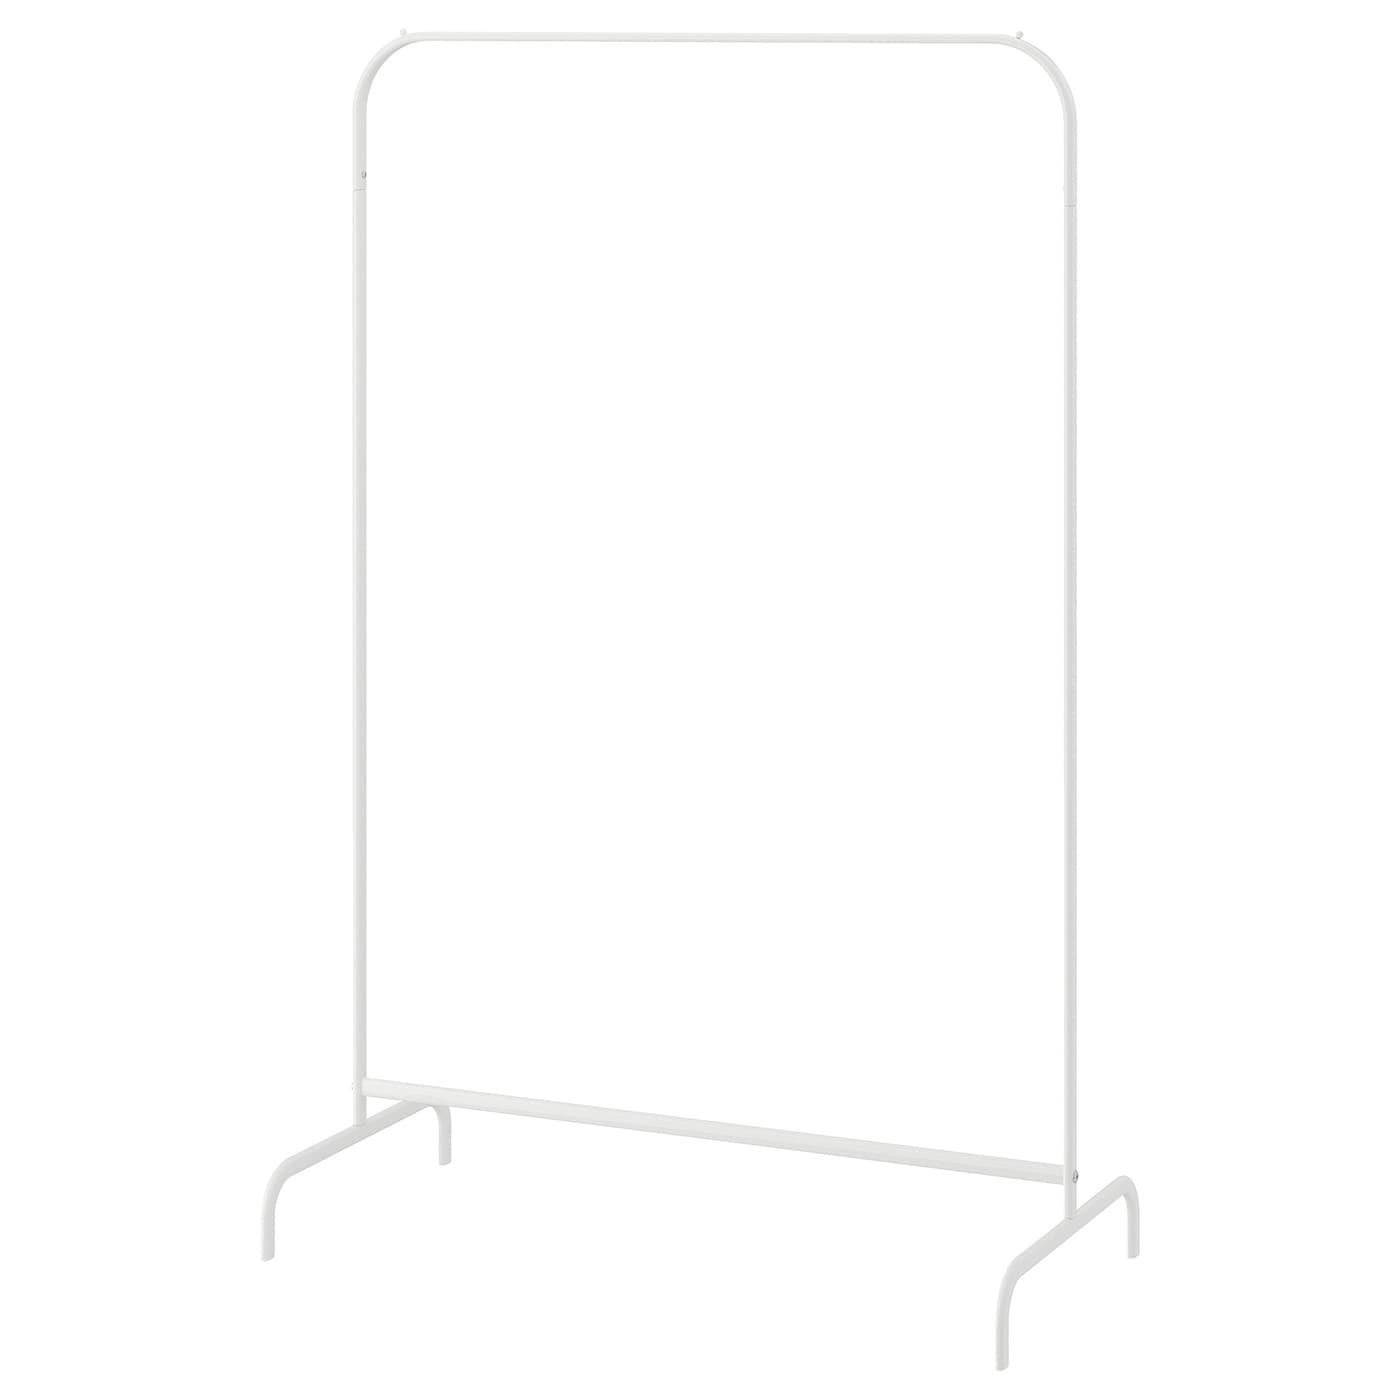 Mulig Burro Para Ropa Blanco 99 X 46 Cm Ikea